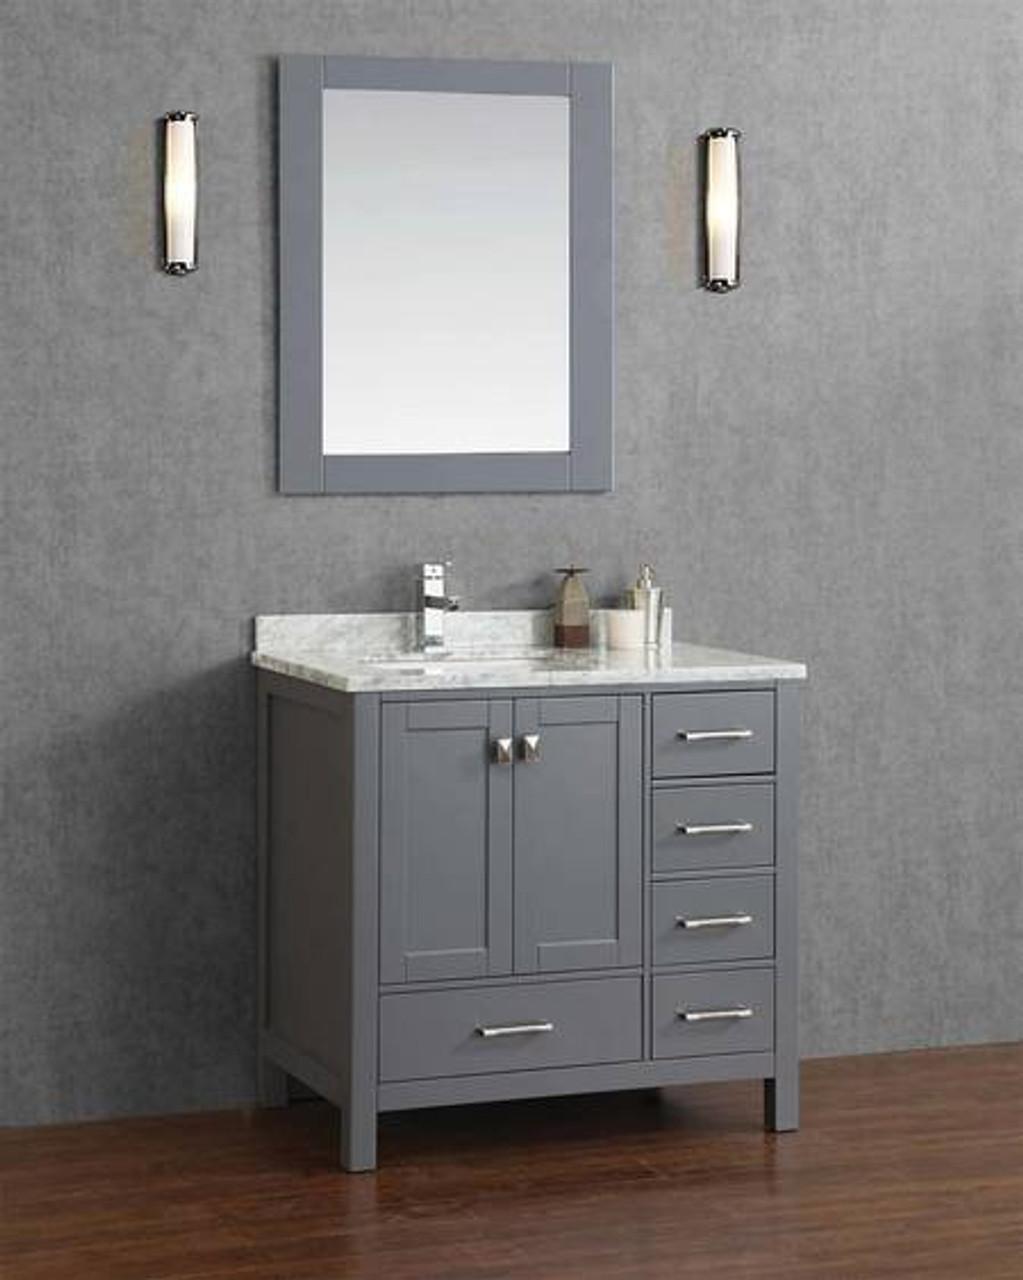 Armada 44 Bathroom Vanity Ice Grey Left Hand Sink York Taps